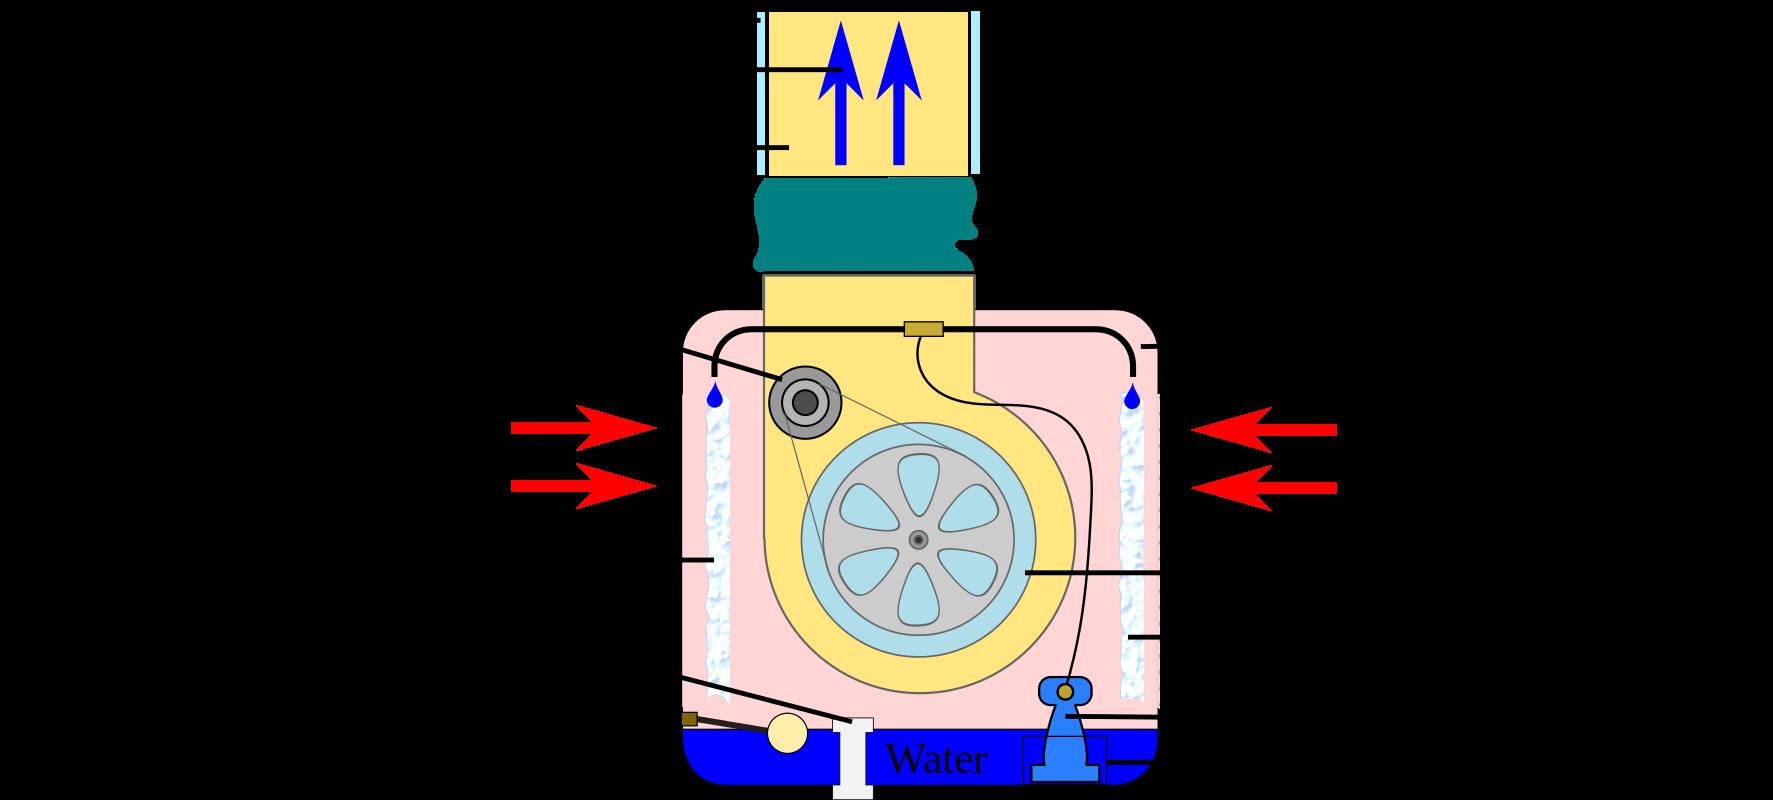 Evaporative cooler illustration